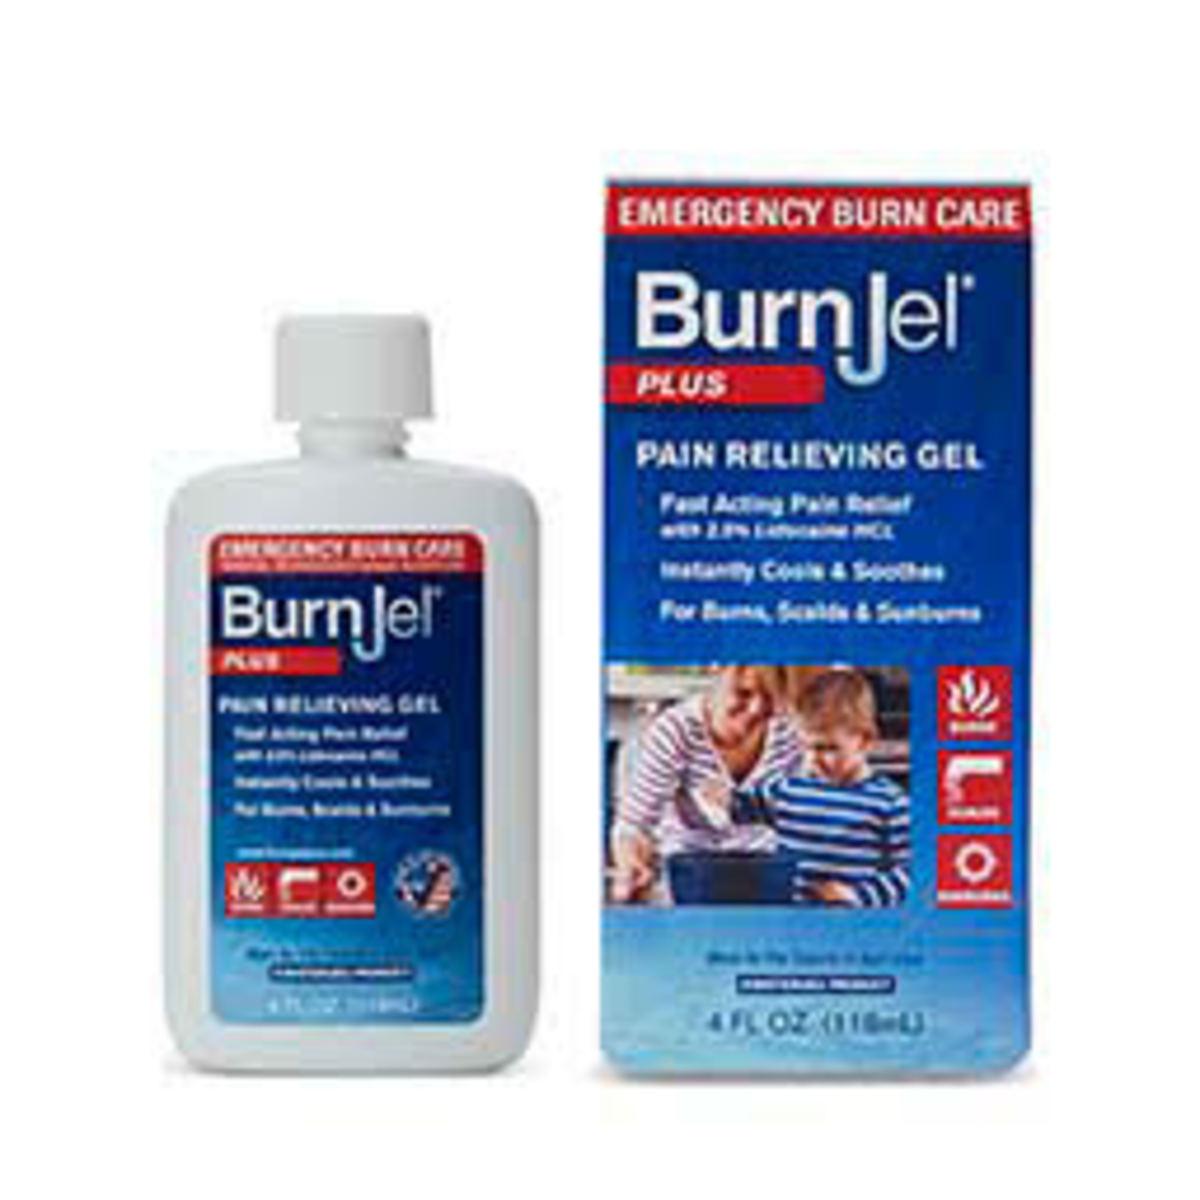 burn jel plus product image